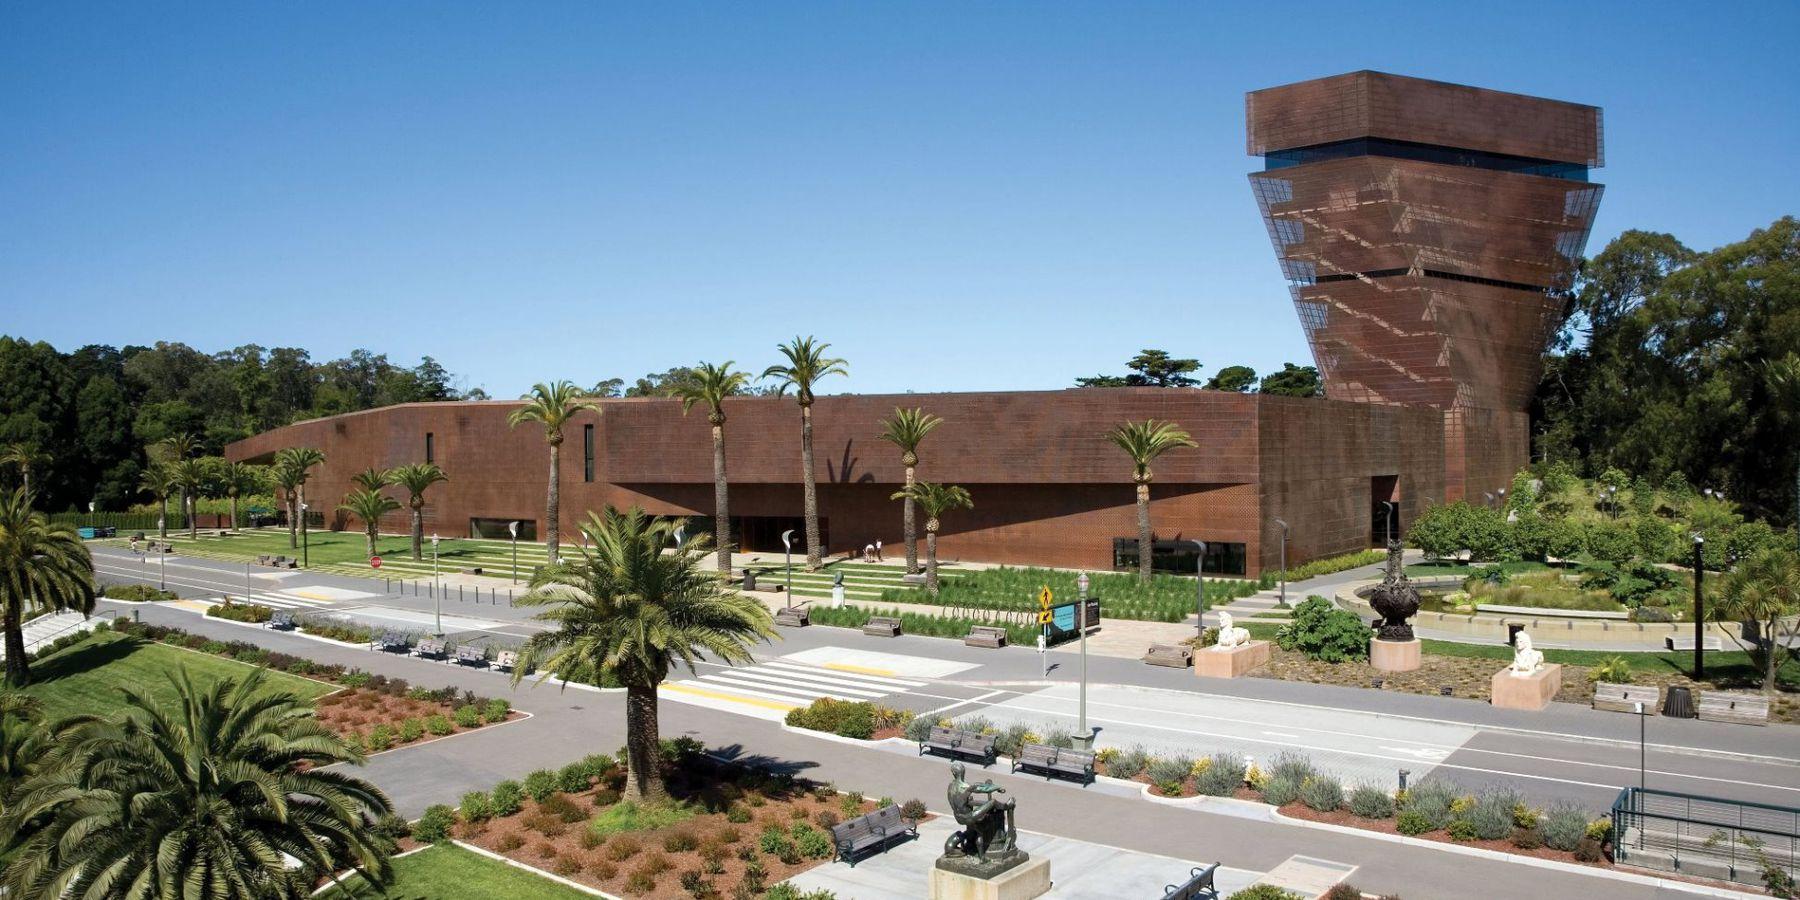 De Young Museum - San Francisco - California - Amerika - Doets Reizen